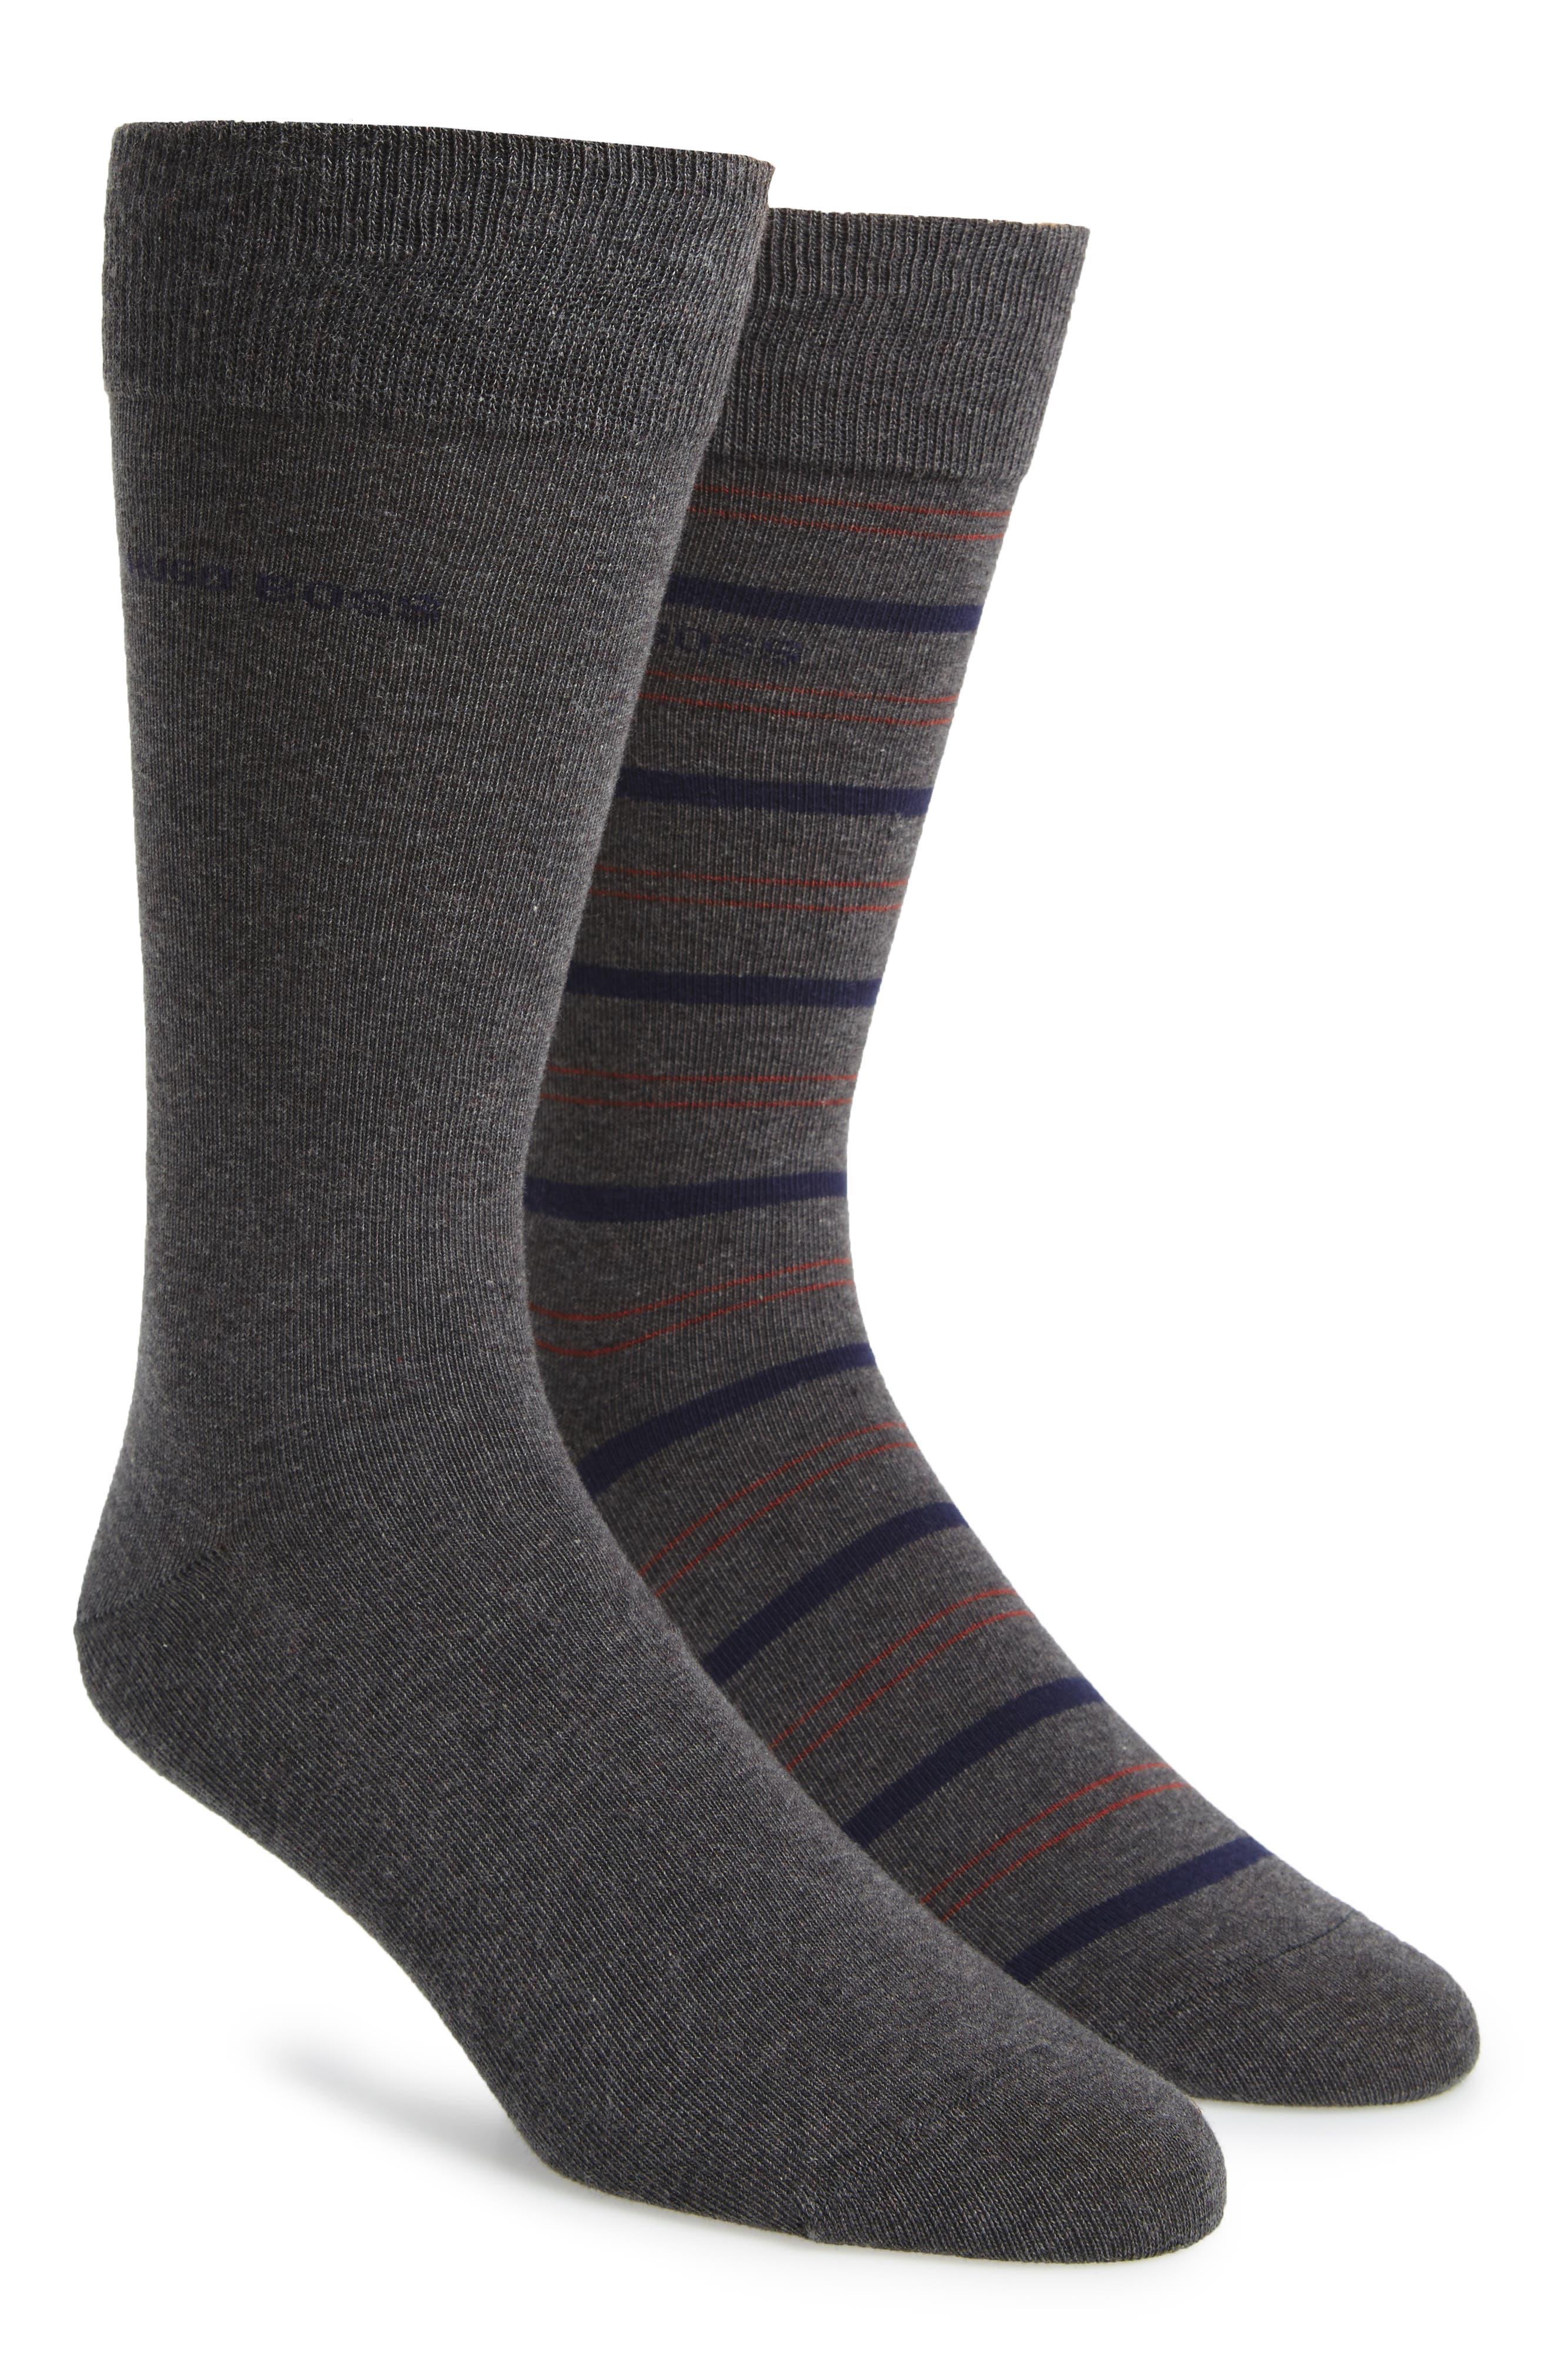 2-Pack Socks,                         Main,                         color, Medium Grey